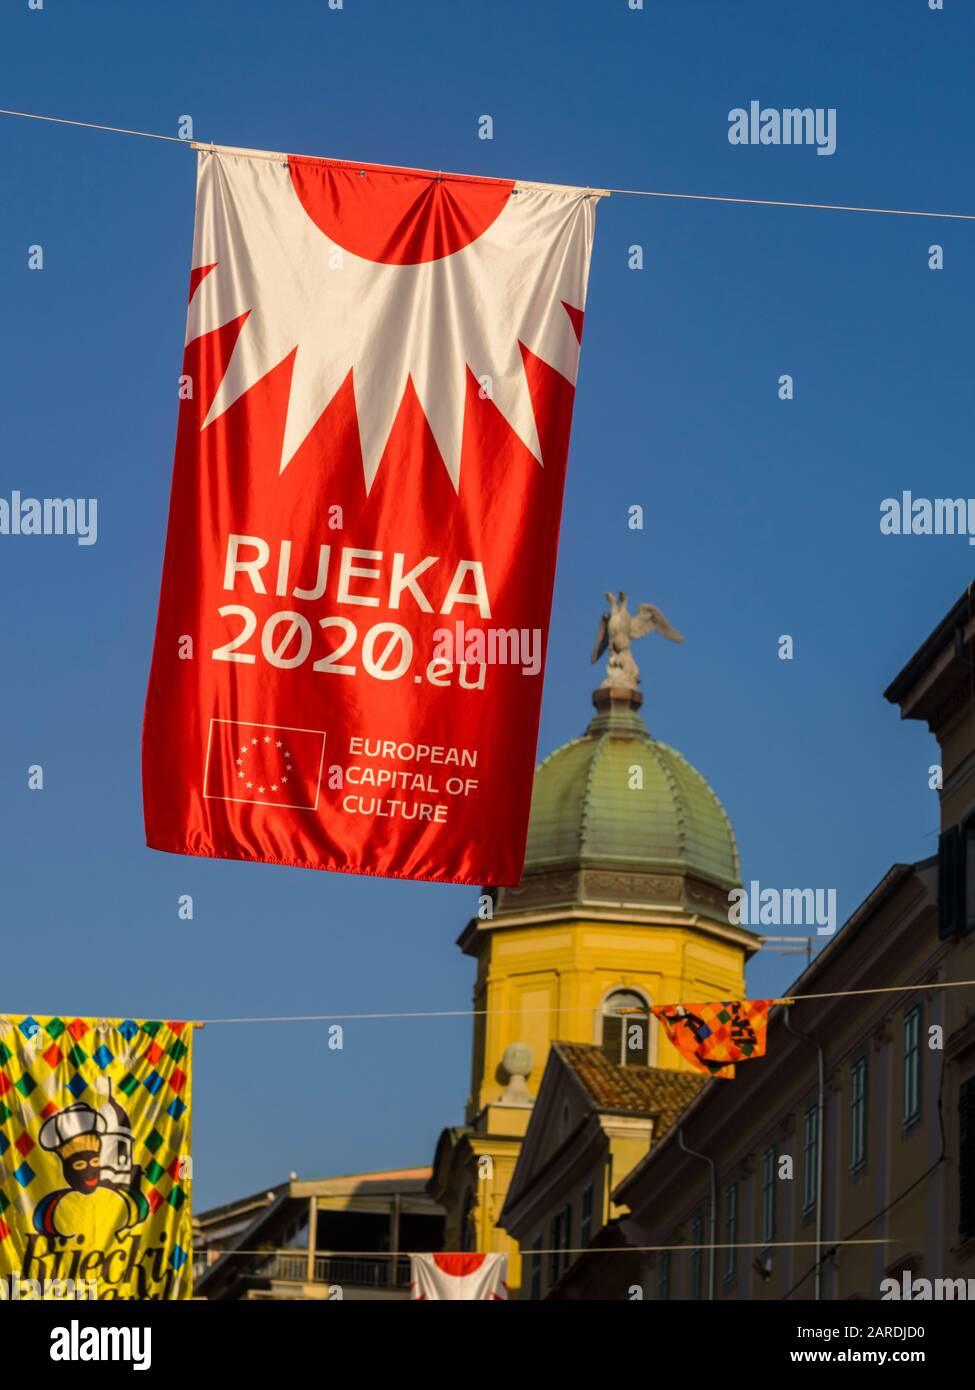 European Capital of Culture preparations before opening EPK 2020 Rijeka in Croatia official flag hanging above Korzo main street Stock Photo